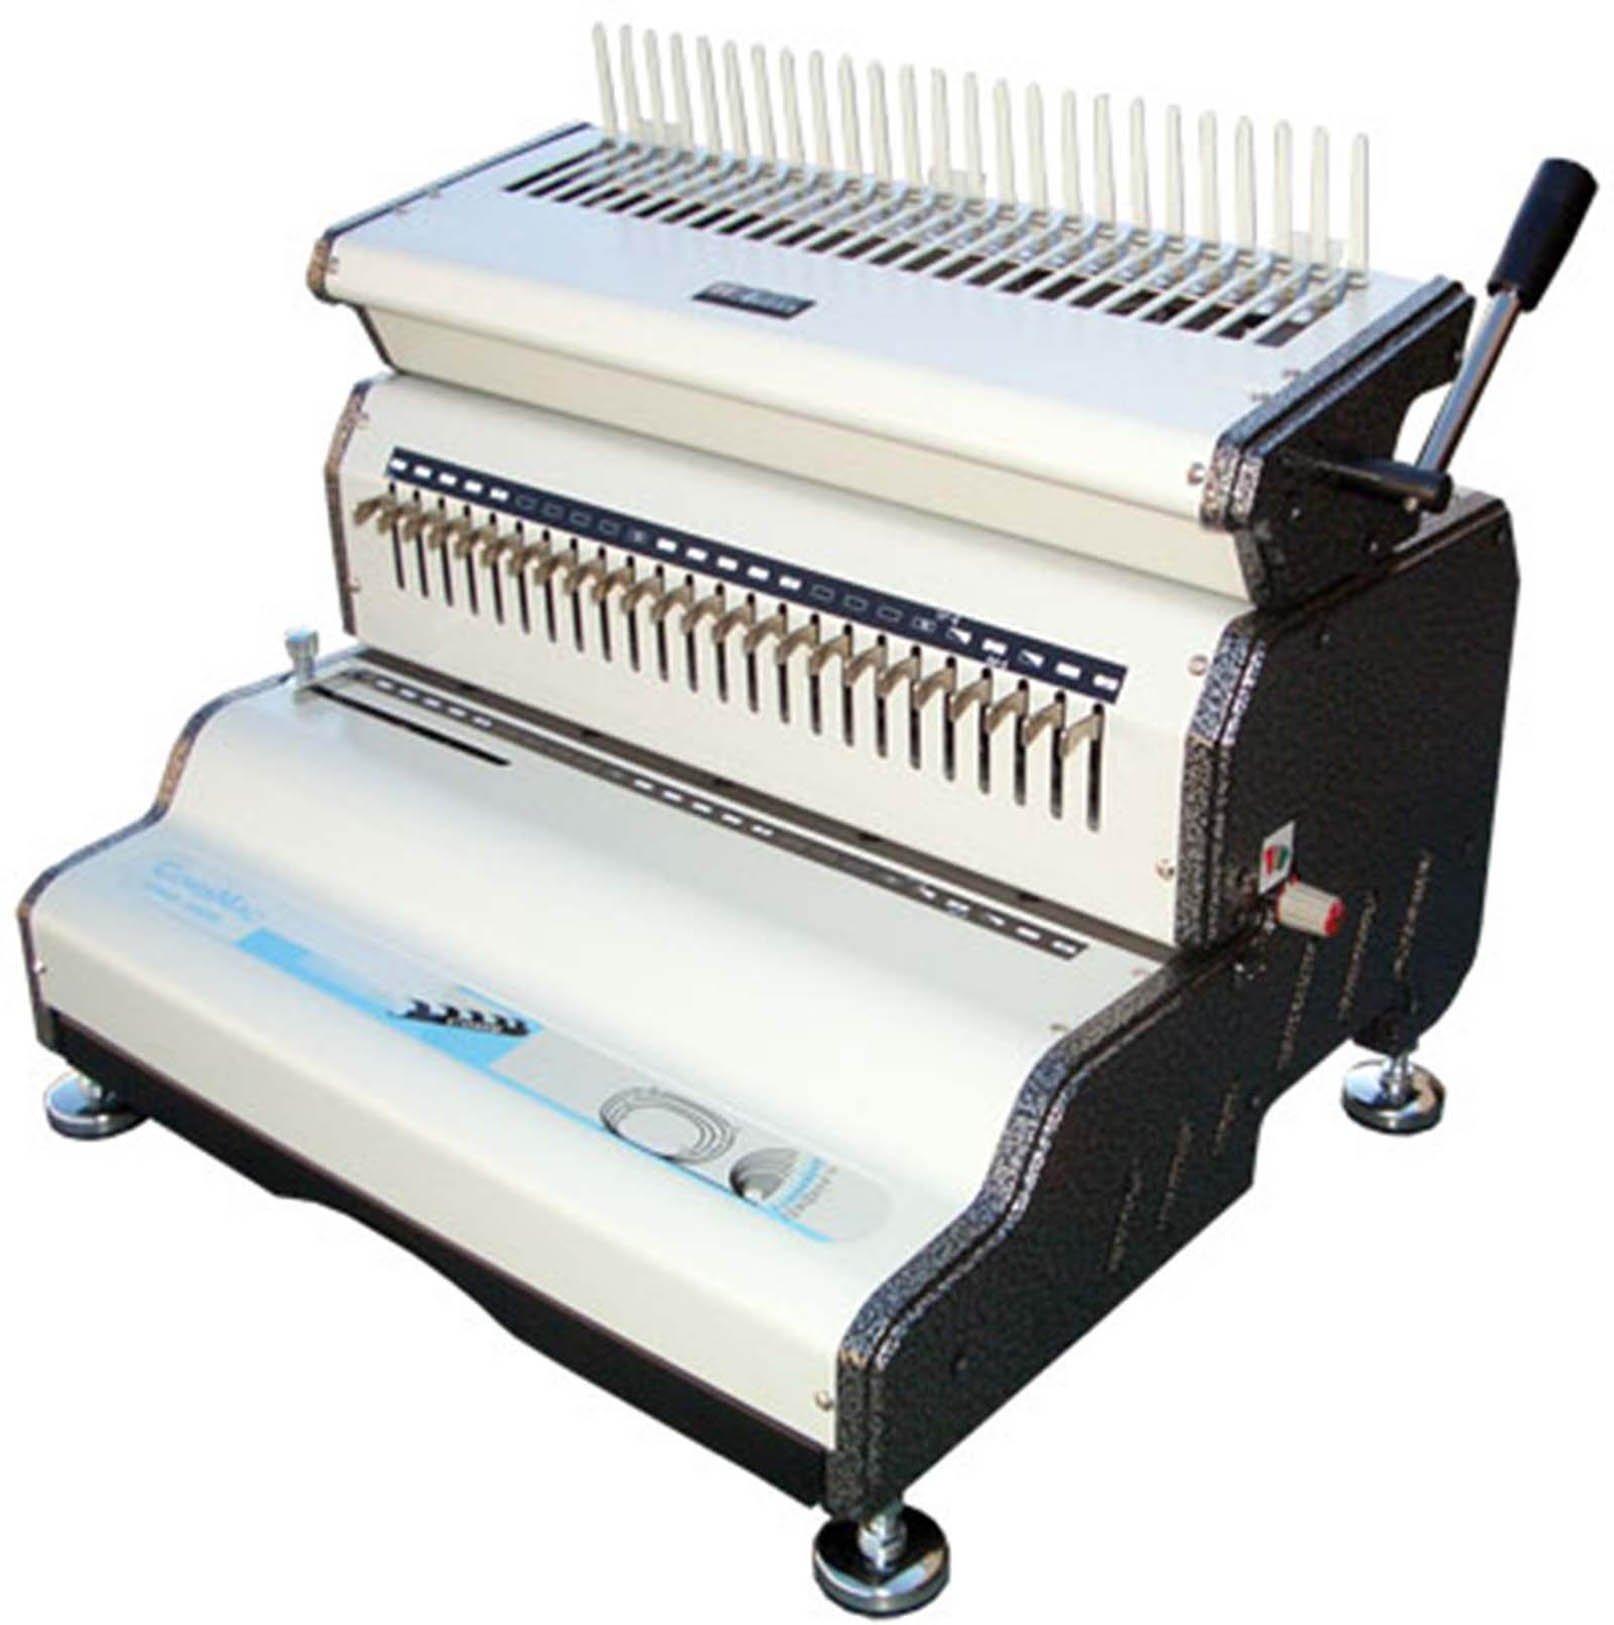 "Akiles CombMac-24E 14"" Comb Binding Machine & Electric Punch, Heavy Duty Comb Opener"